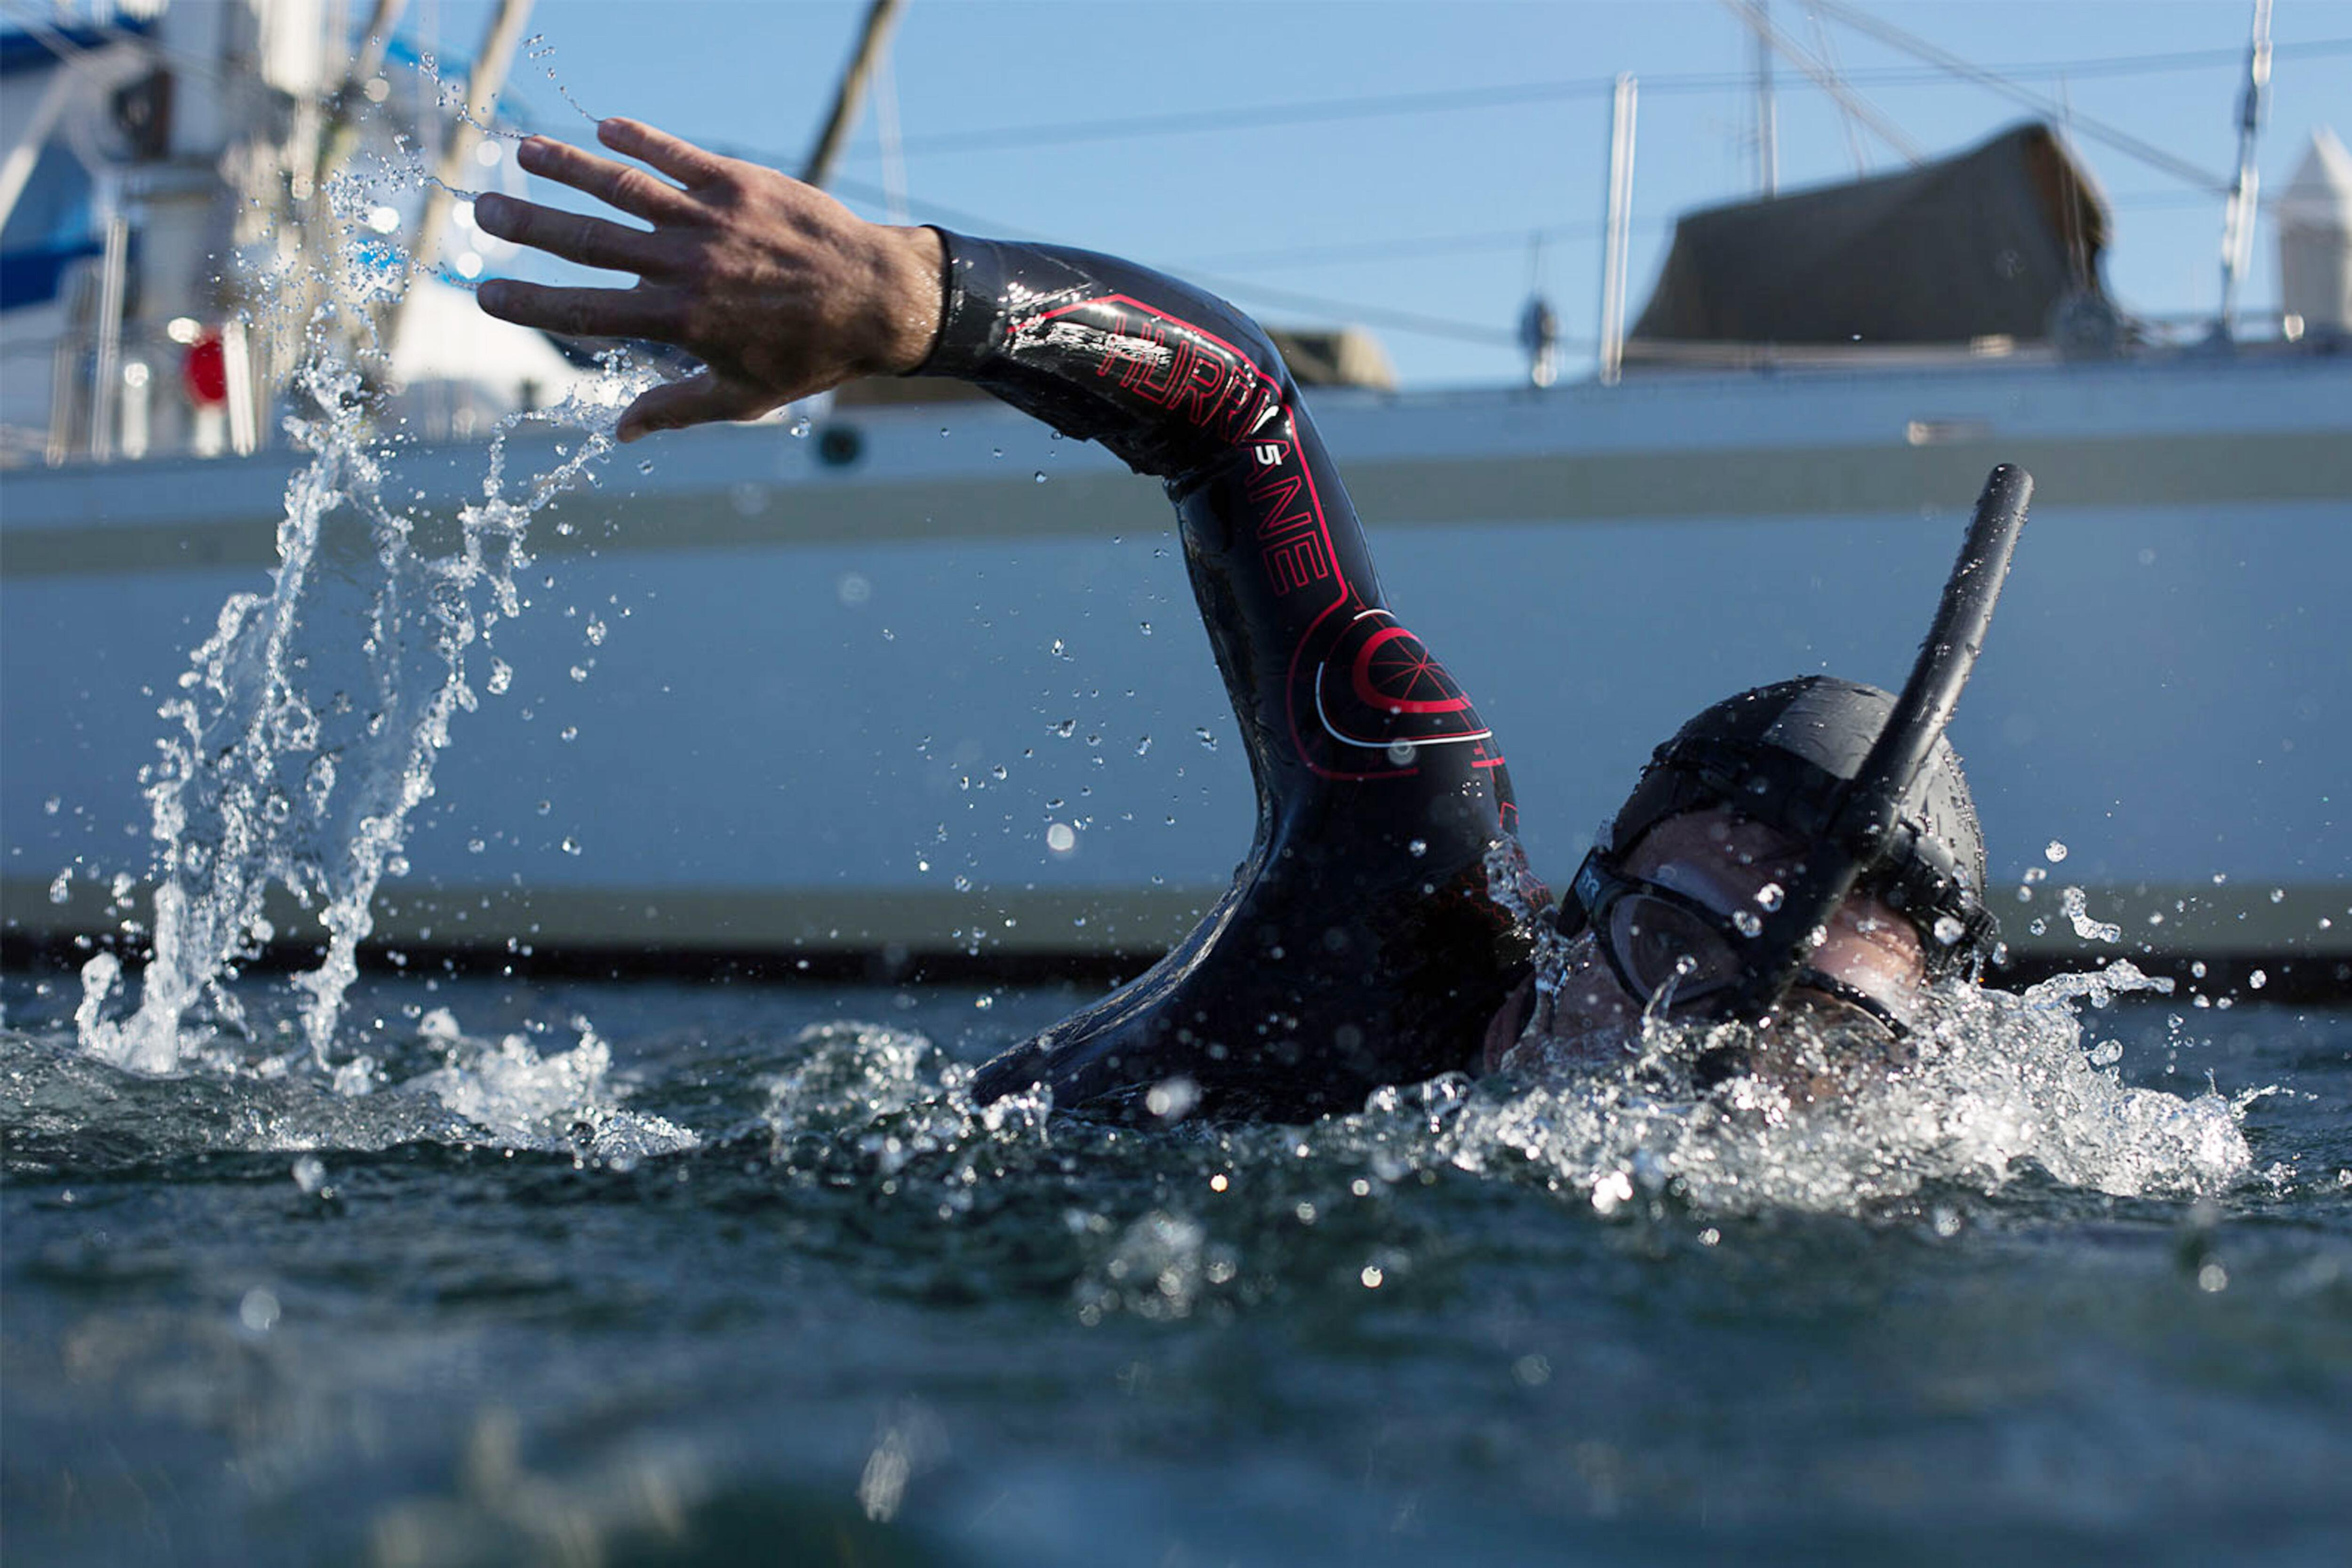 Bild zu Ben Lecomte, Rekordversuch, Schwimmen, Pazifik,